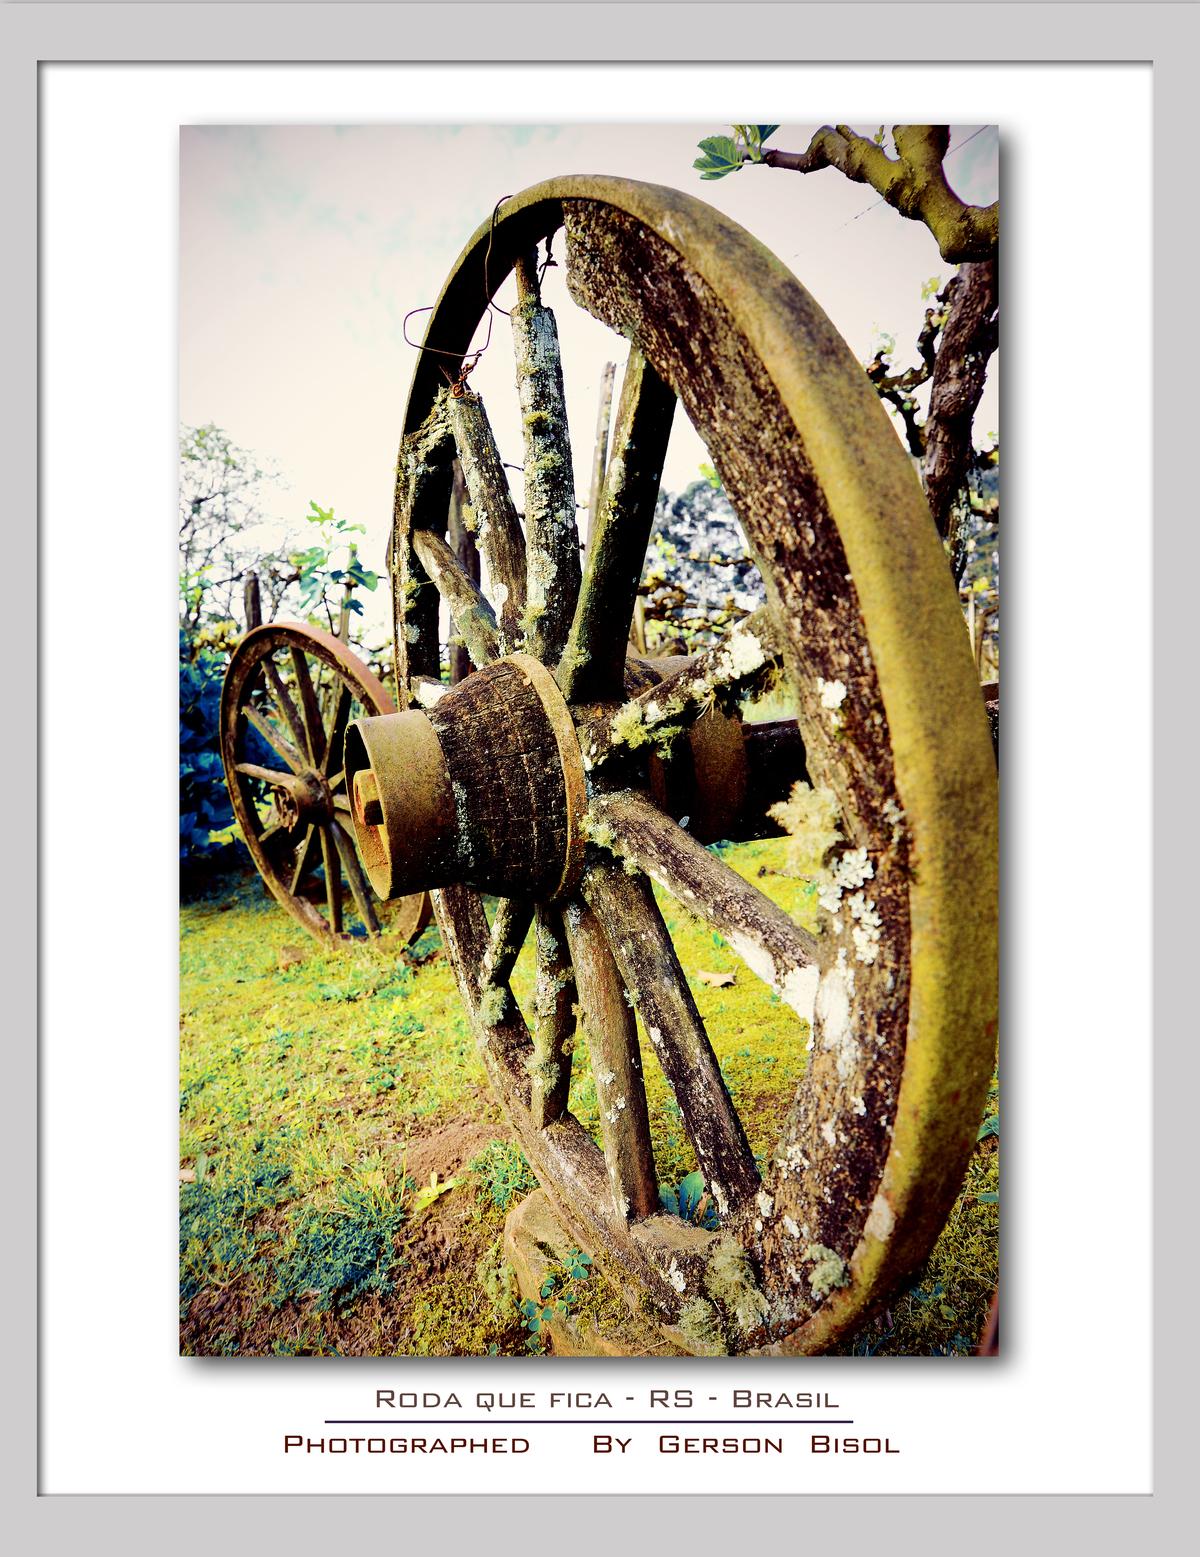 Imagem capa - Roda Que Fica por Gerson Bisol